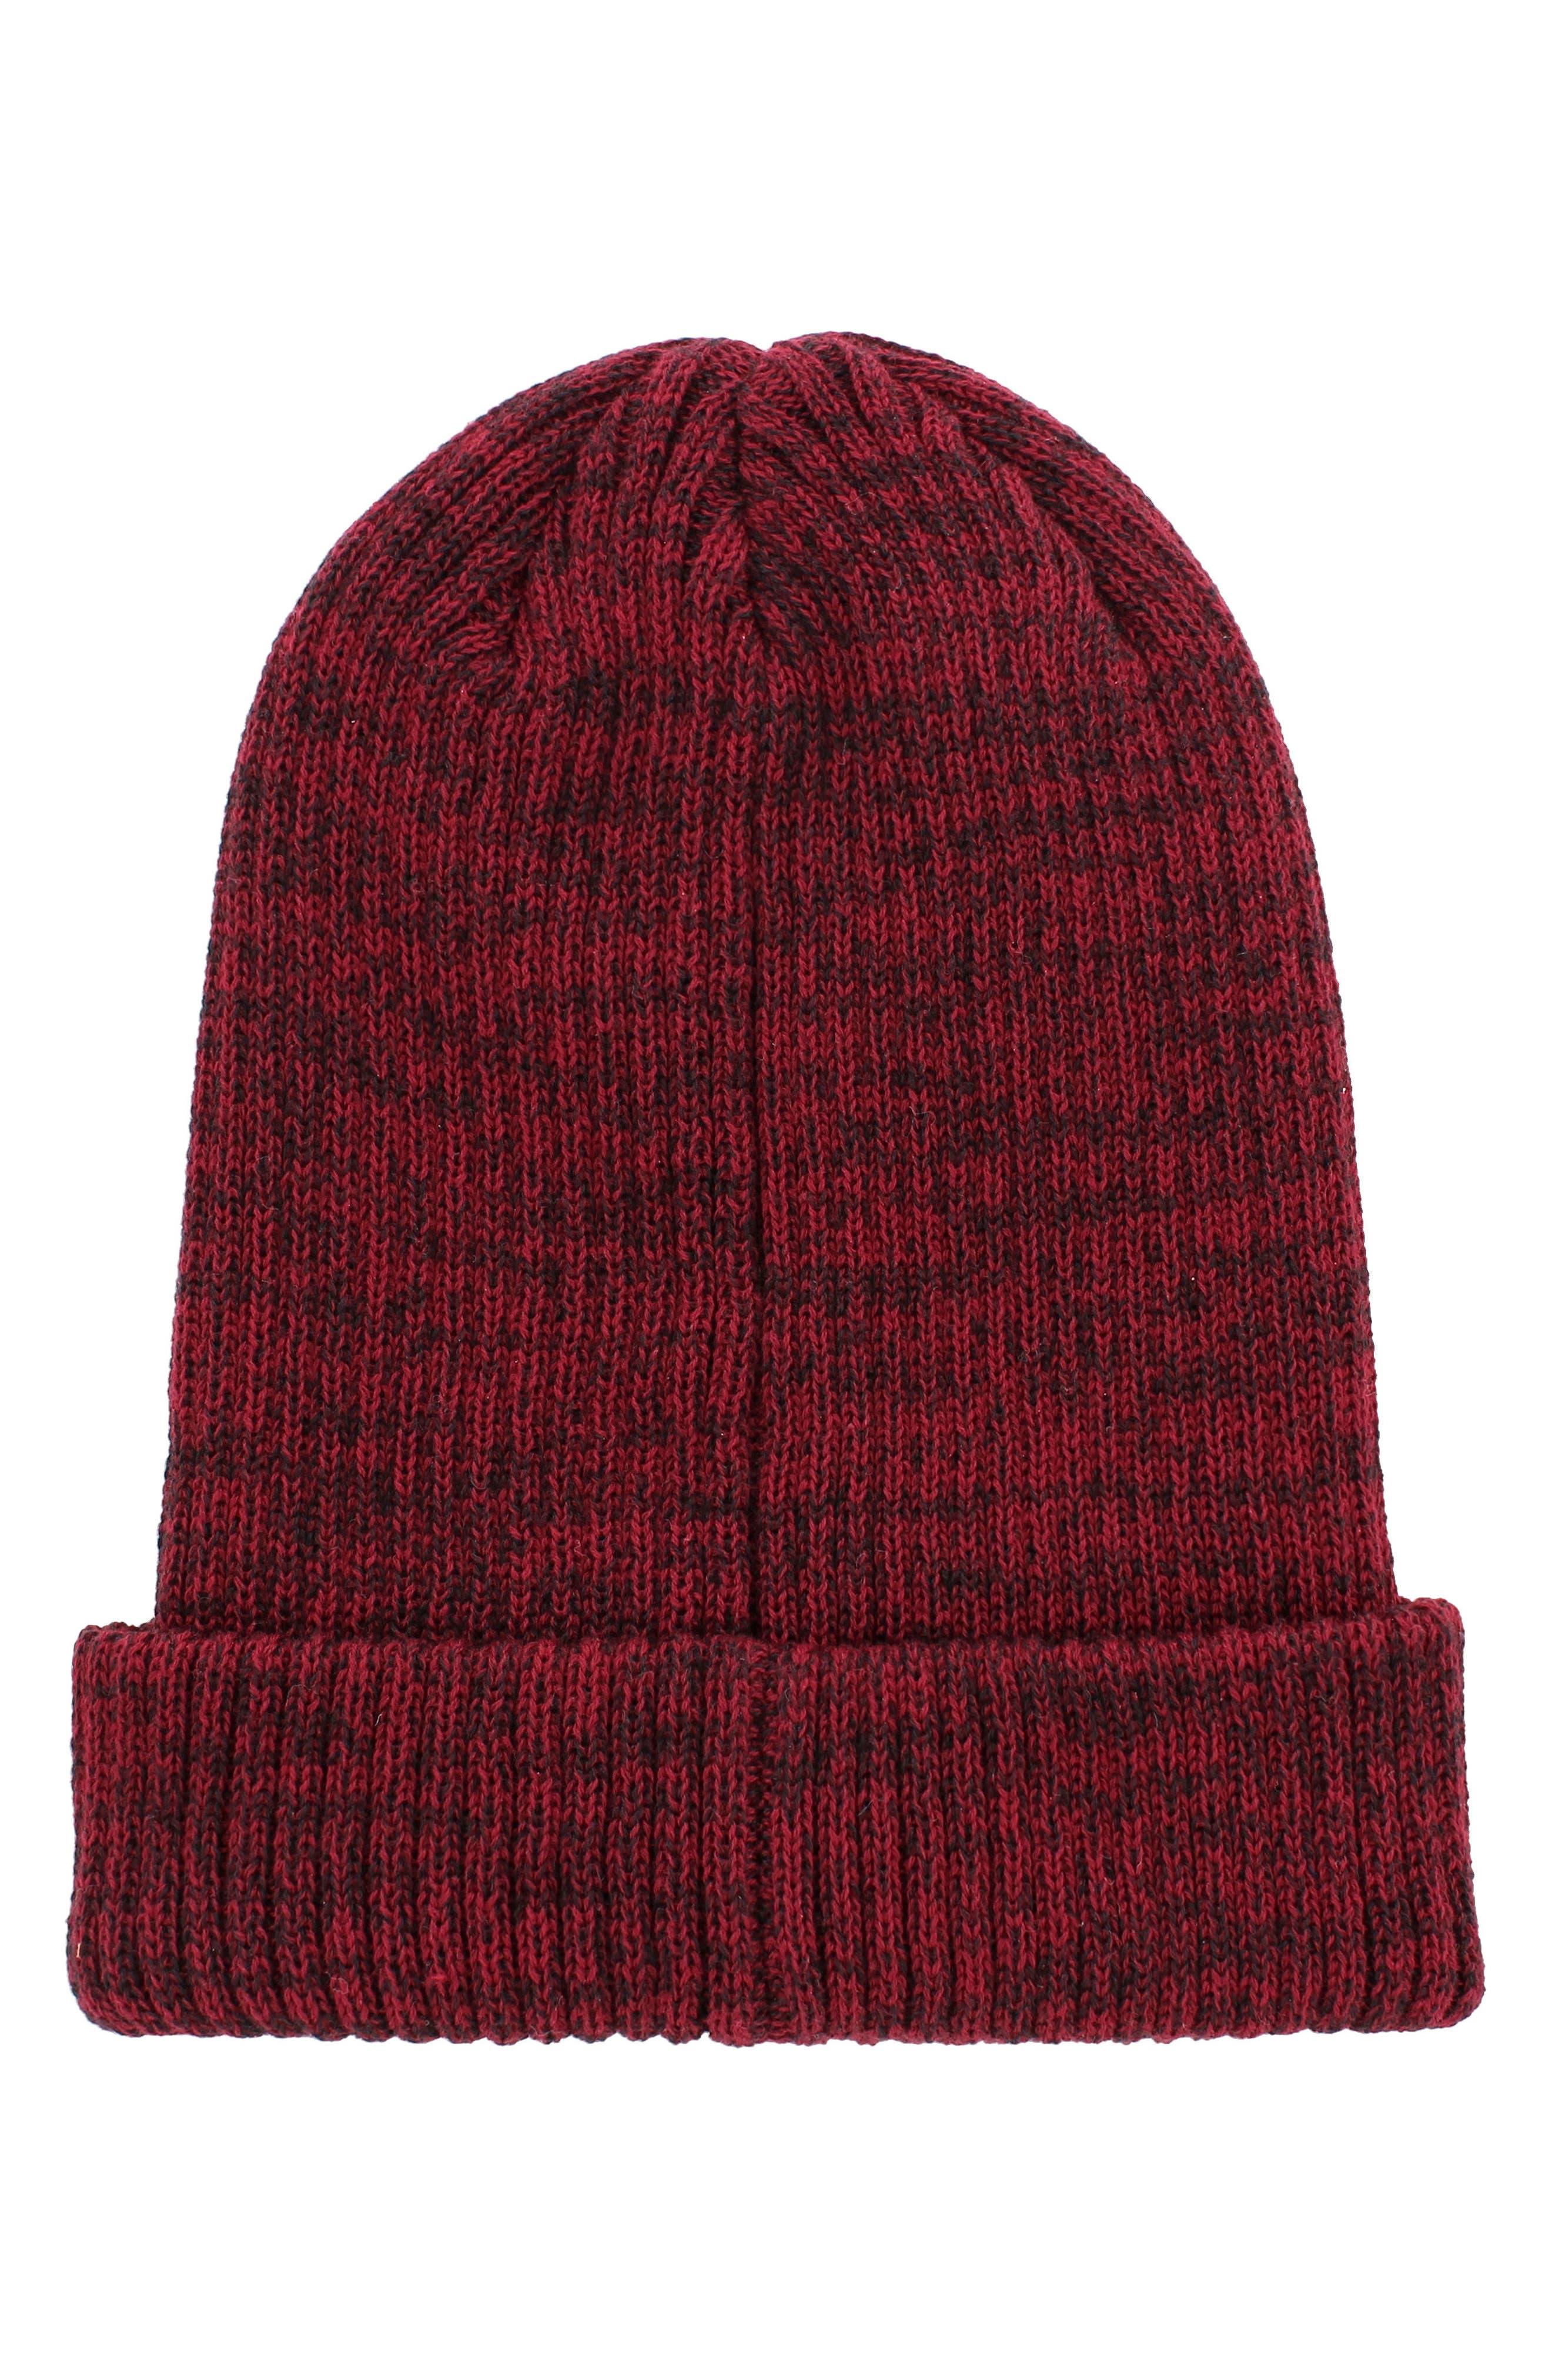 NMD Knit Cap,                             Alternate thumbnail 8, color,